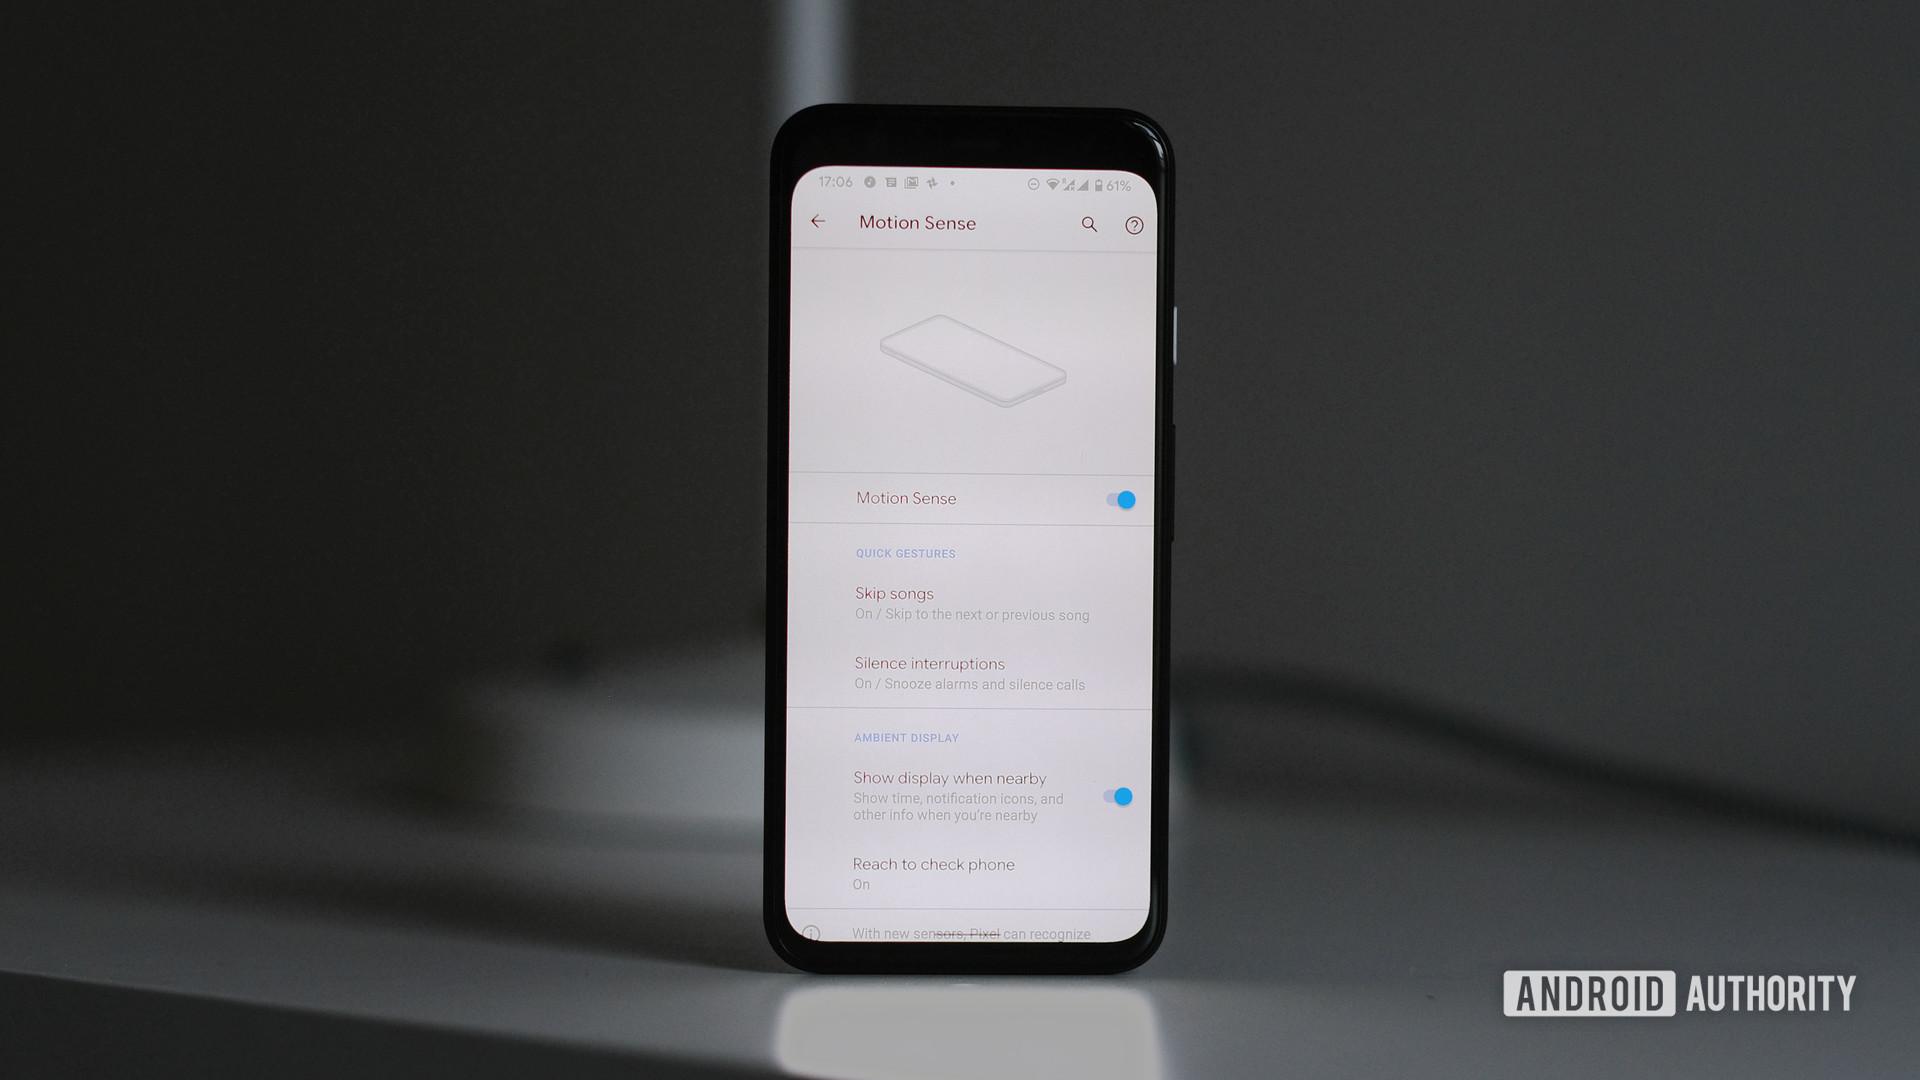 Google Pixel 4 Motion Sense menu for Soli radar